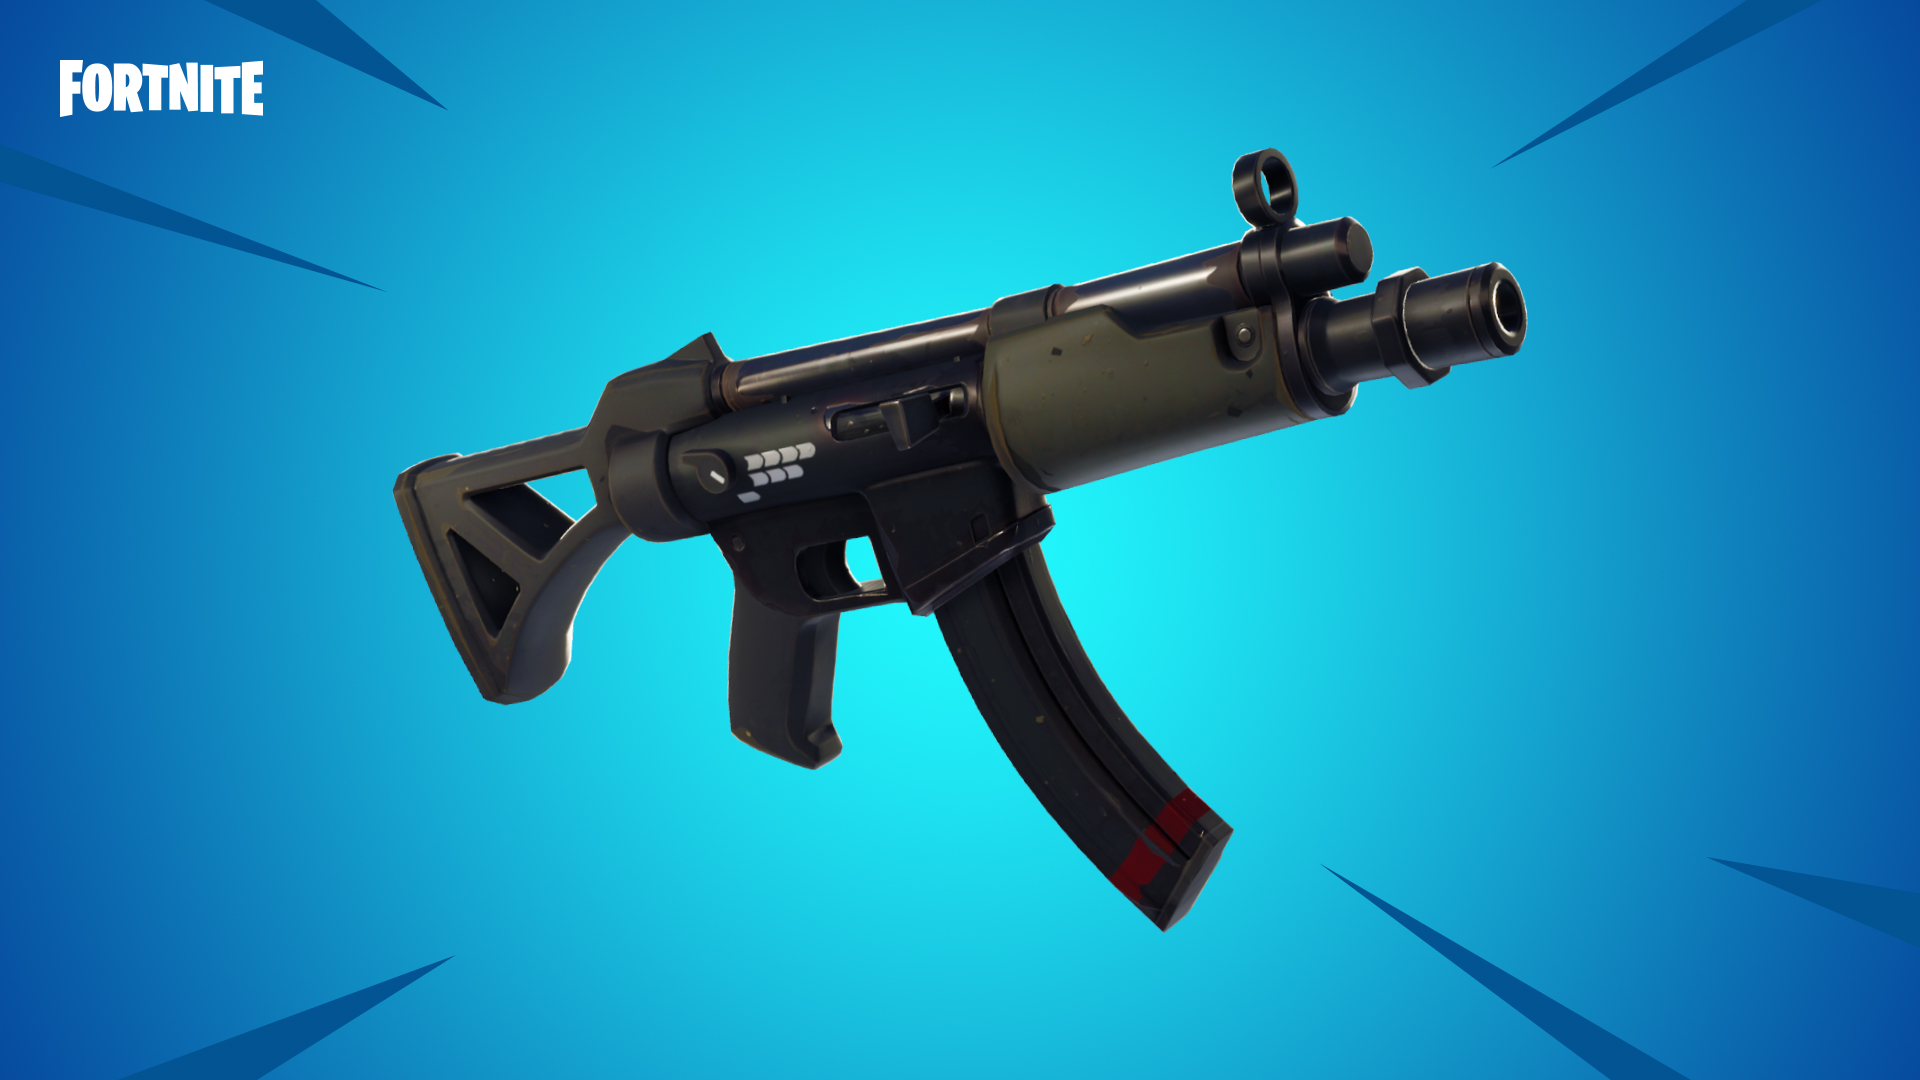 image via epic games - legendary dual pistols fortnite